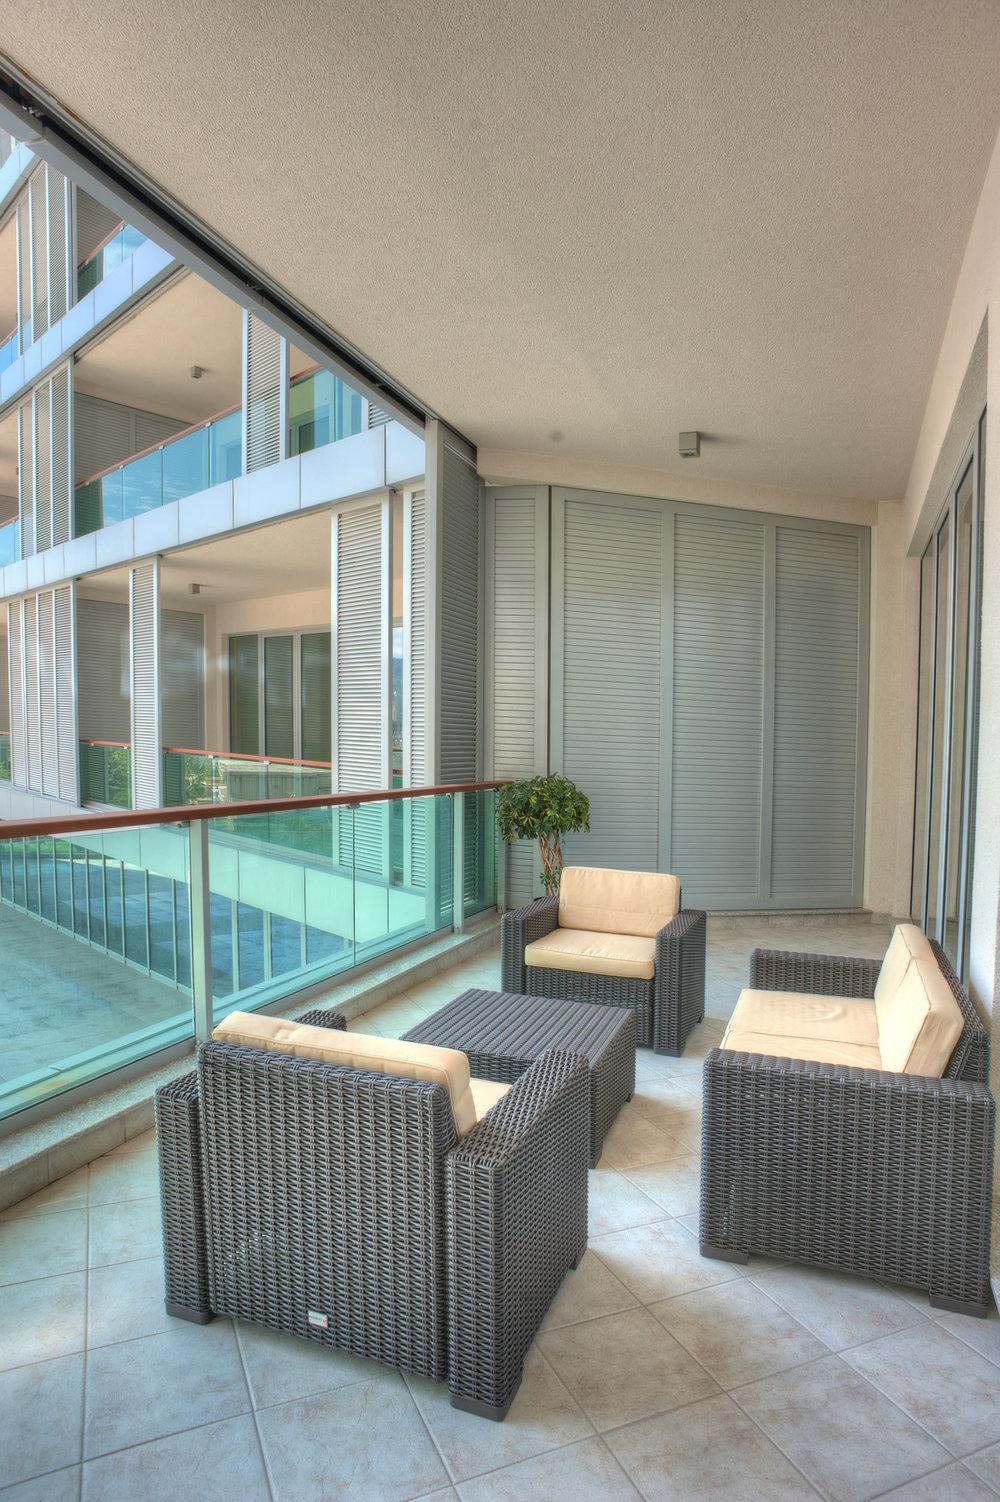 Three bedroom apartment in Budva